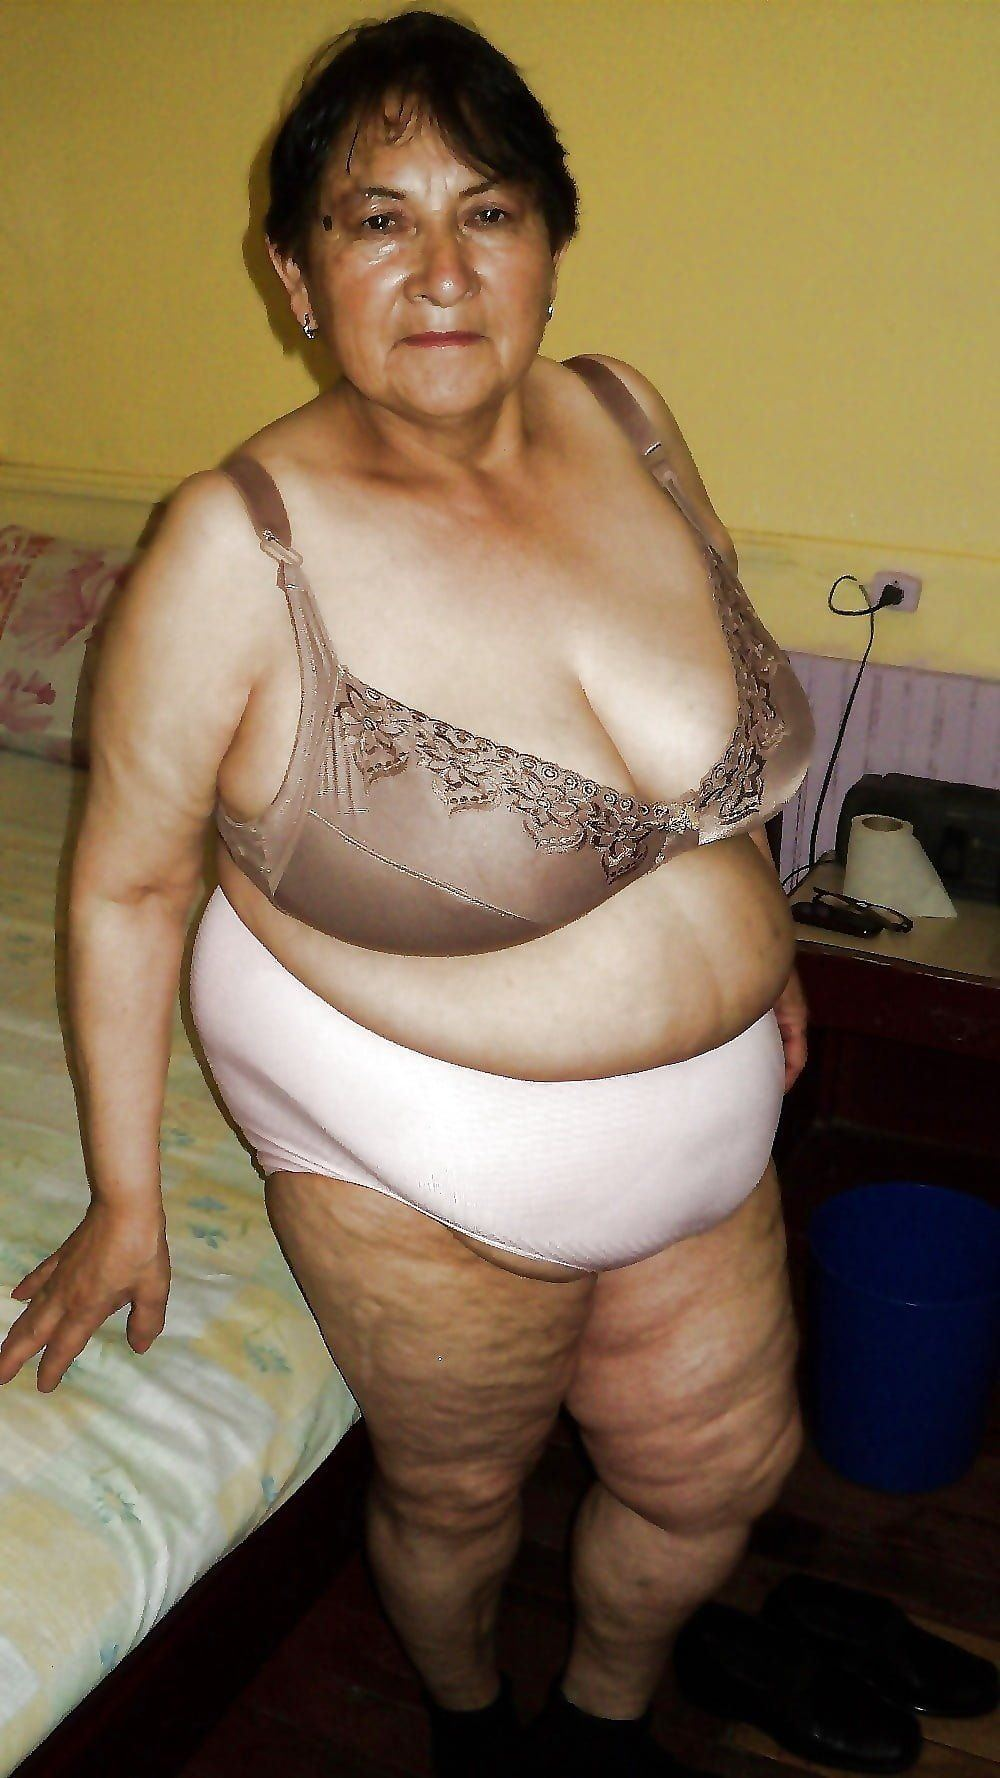 Actrices Pornos Abuelas granny abuela excellent porno website image. comments: 2